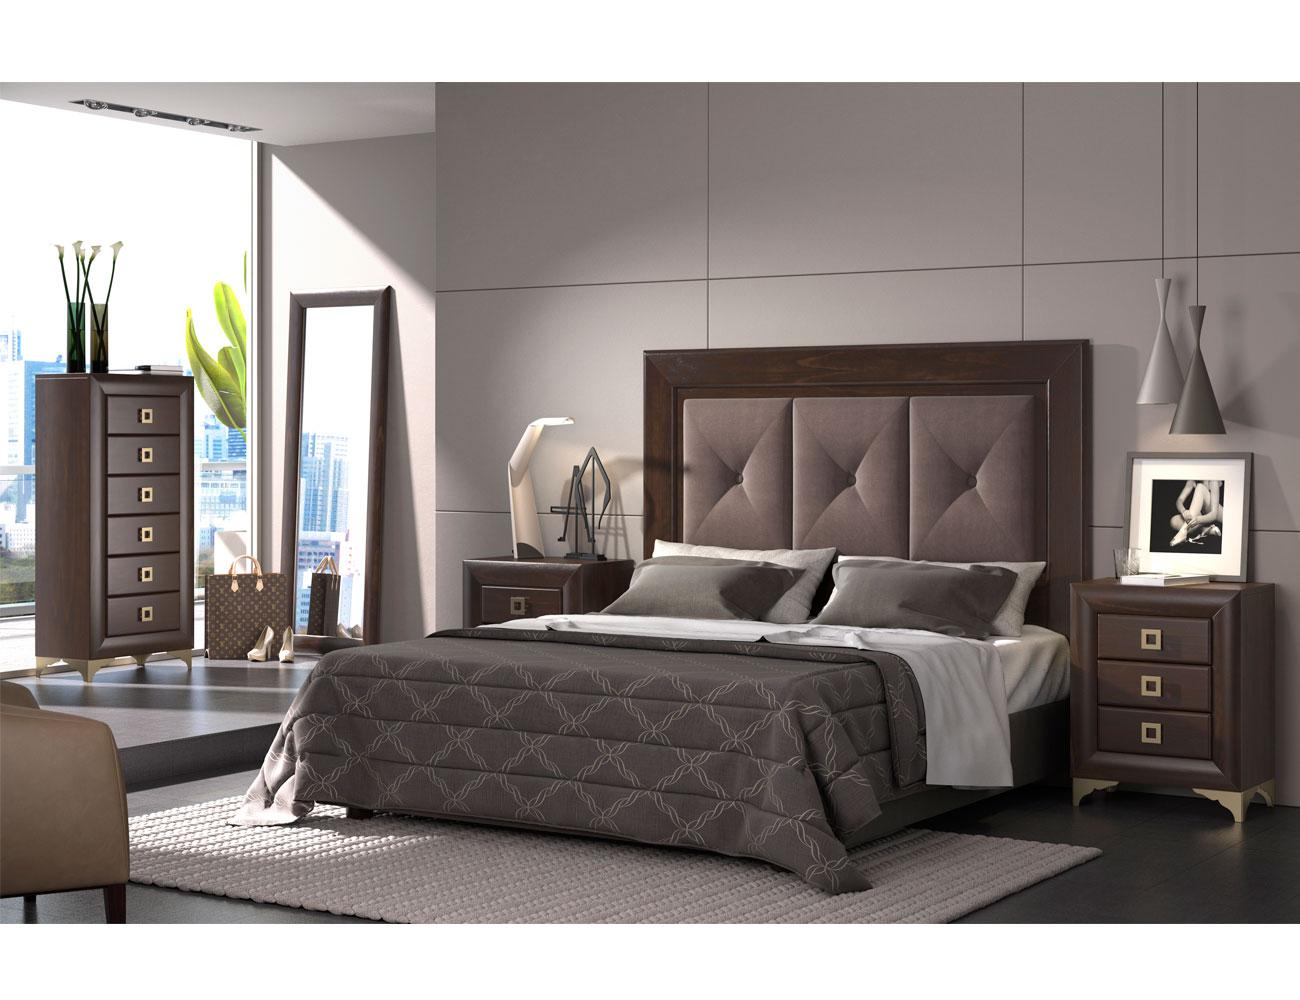 Dormitorio matrimonio nogal tapizado patas1